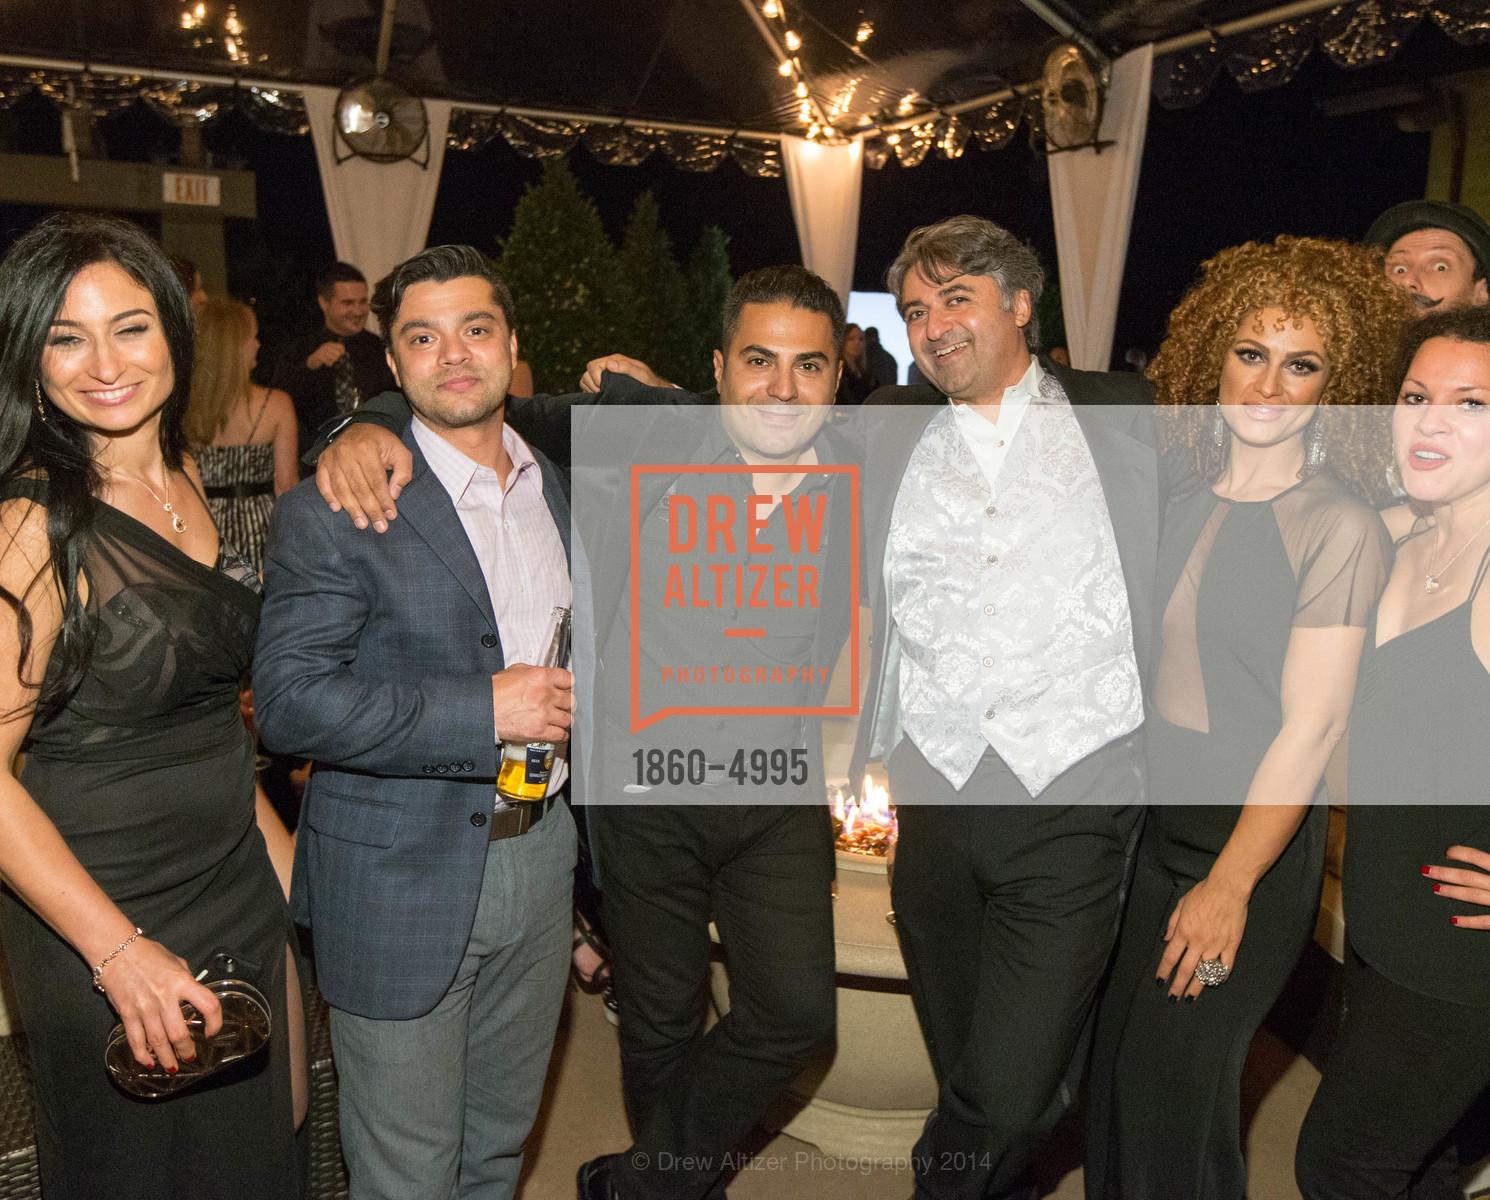 Leila Rose, Mike Fard, Hooman Khalili, Asal, Photo #1860-4995